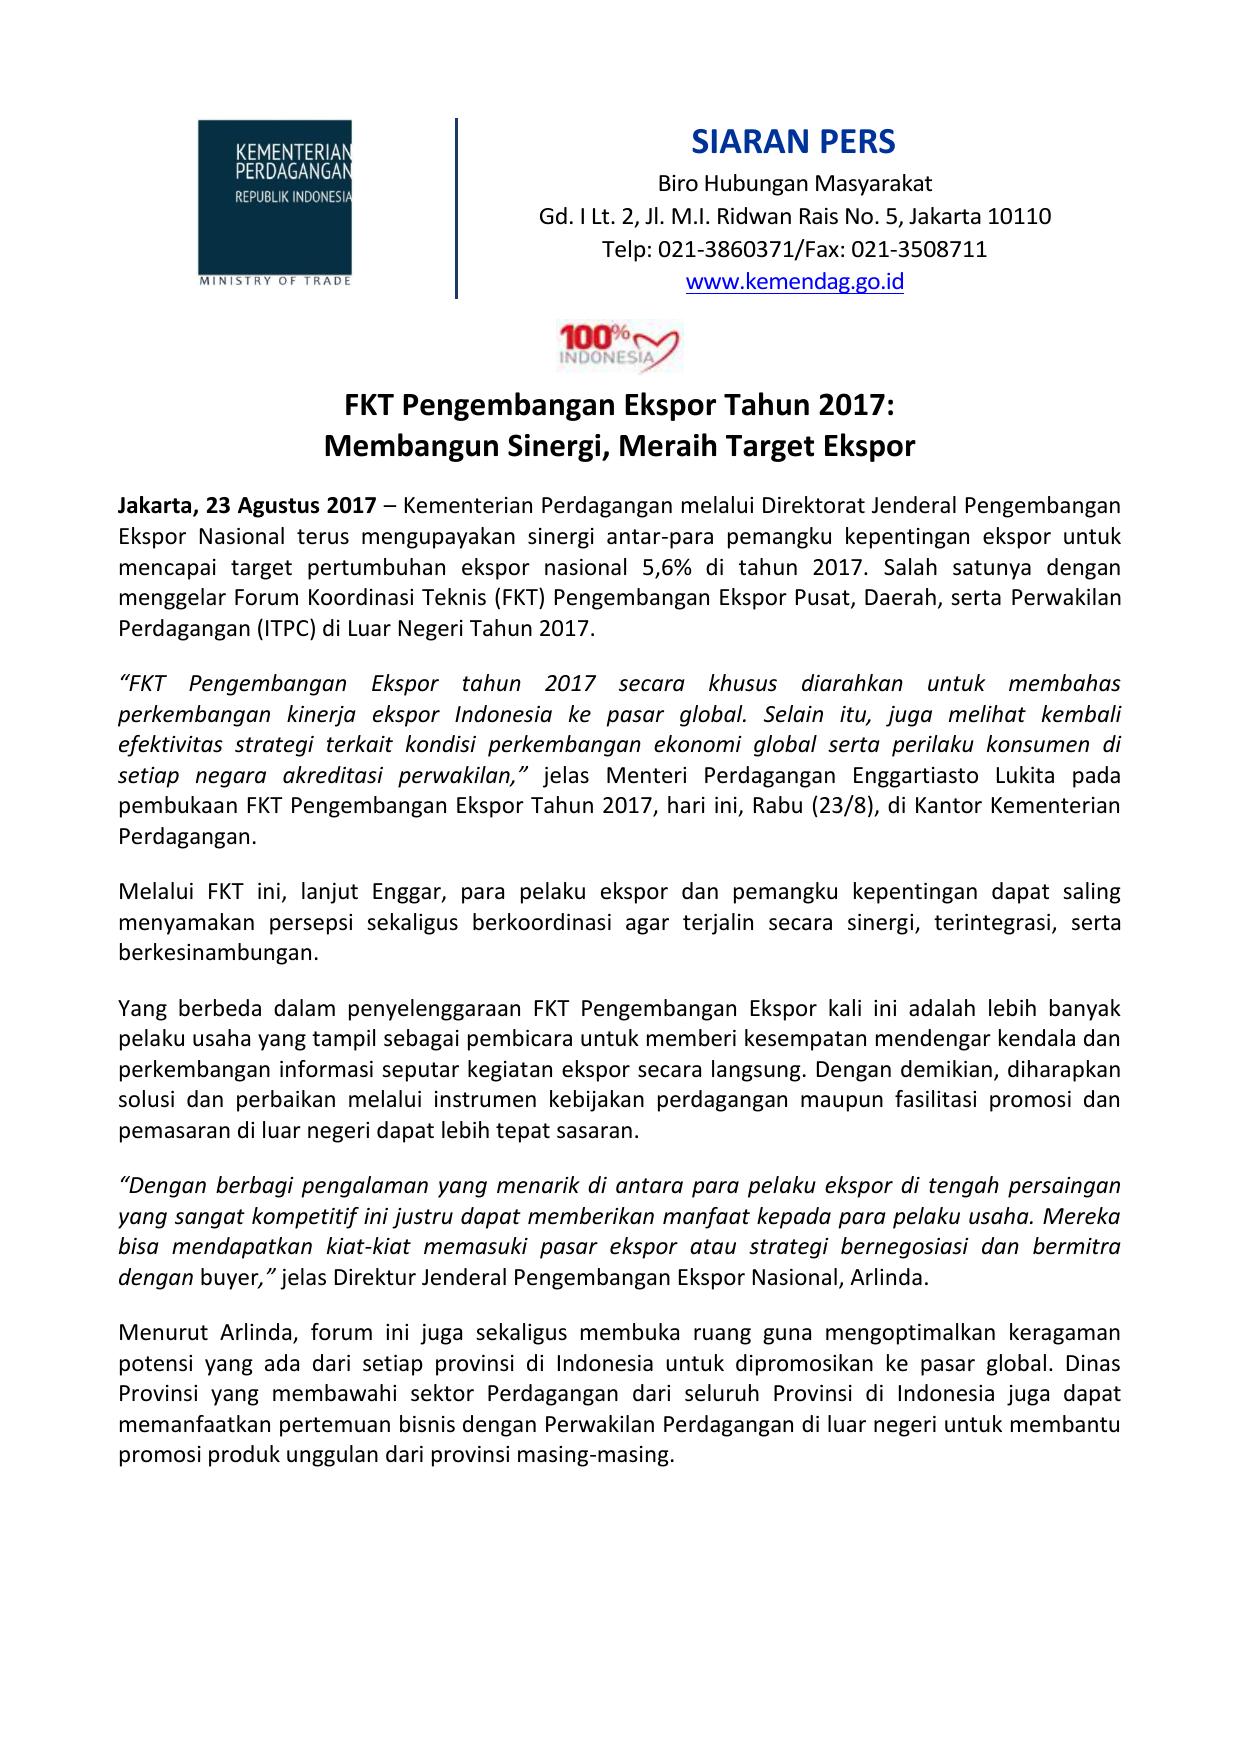 Strategi Perdagangan - cryptonews.id: portal web Forex bagi trader